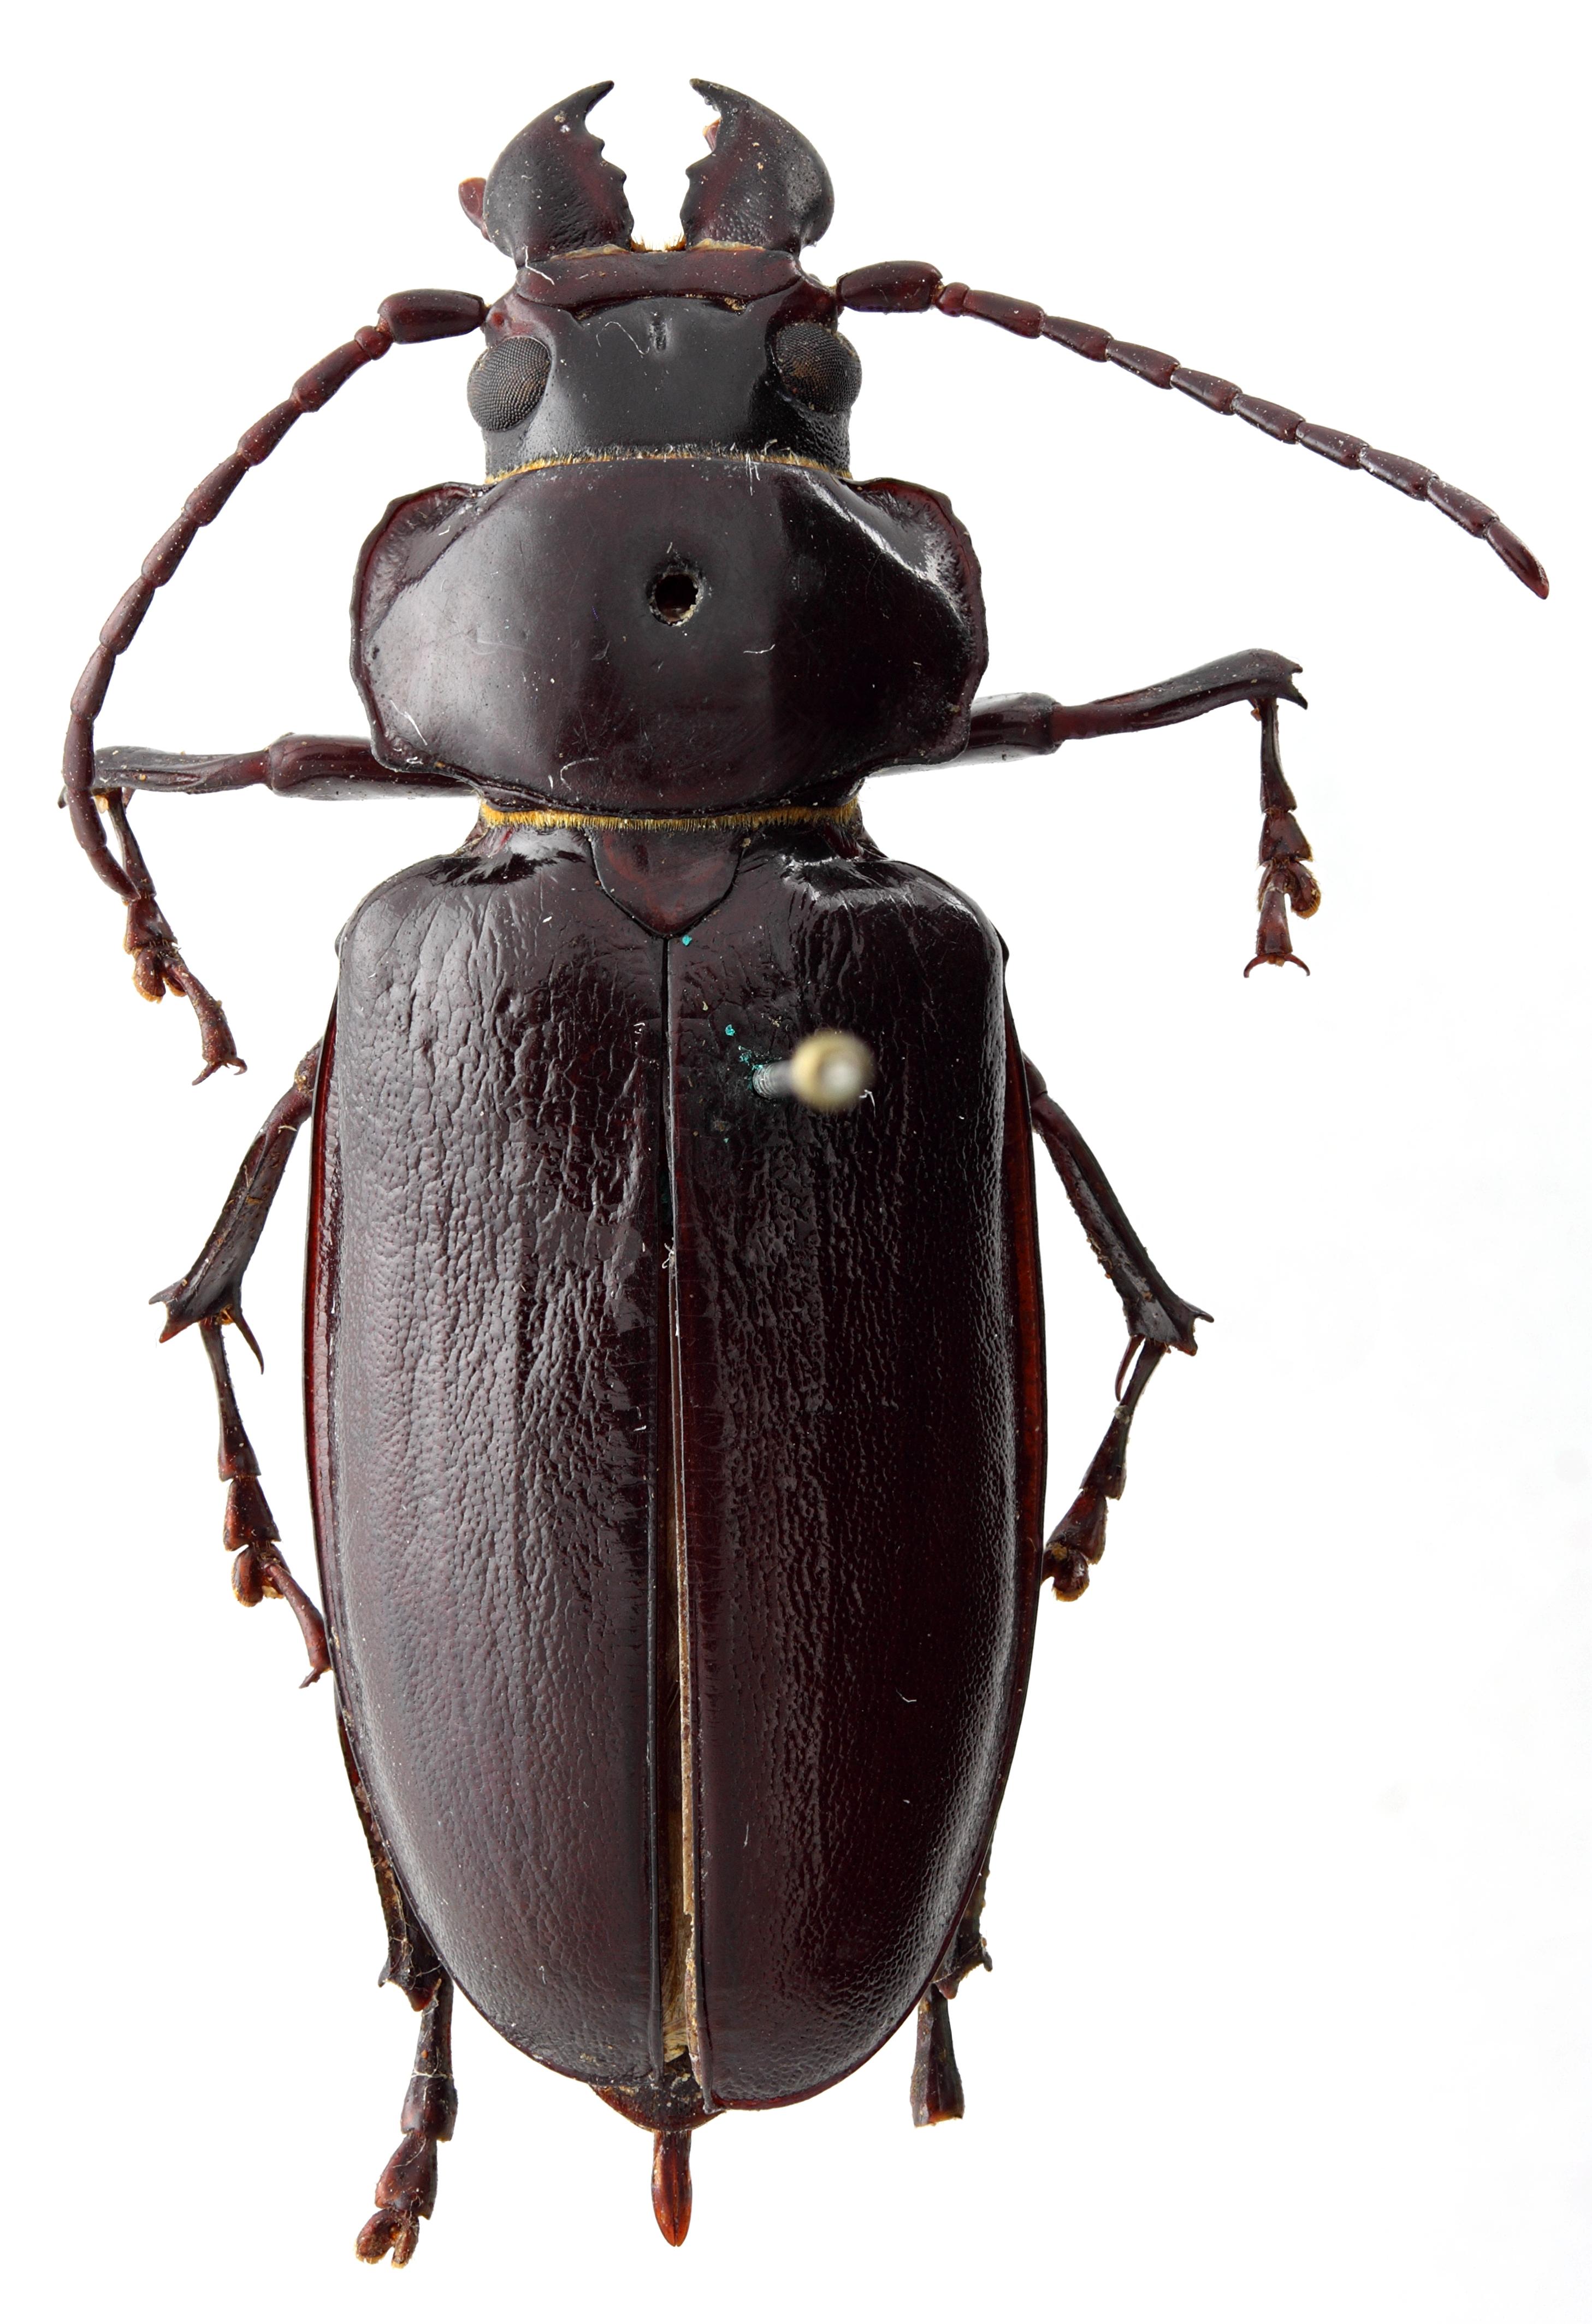 Notophysis cloetensi 01 HP Holotype F 040 BRUS 201405.jpg